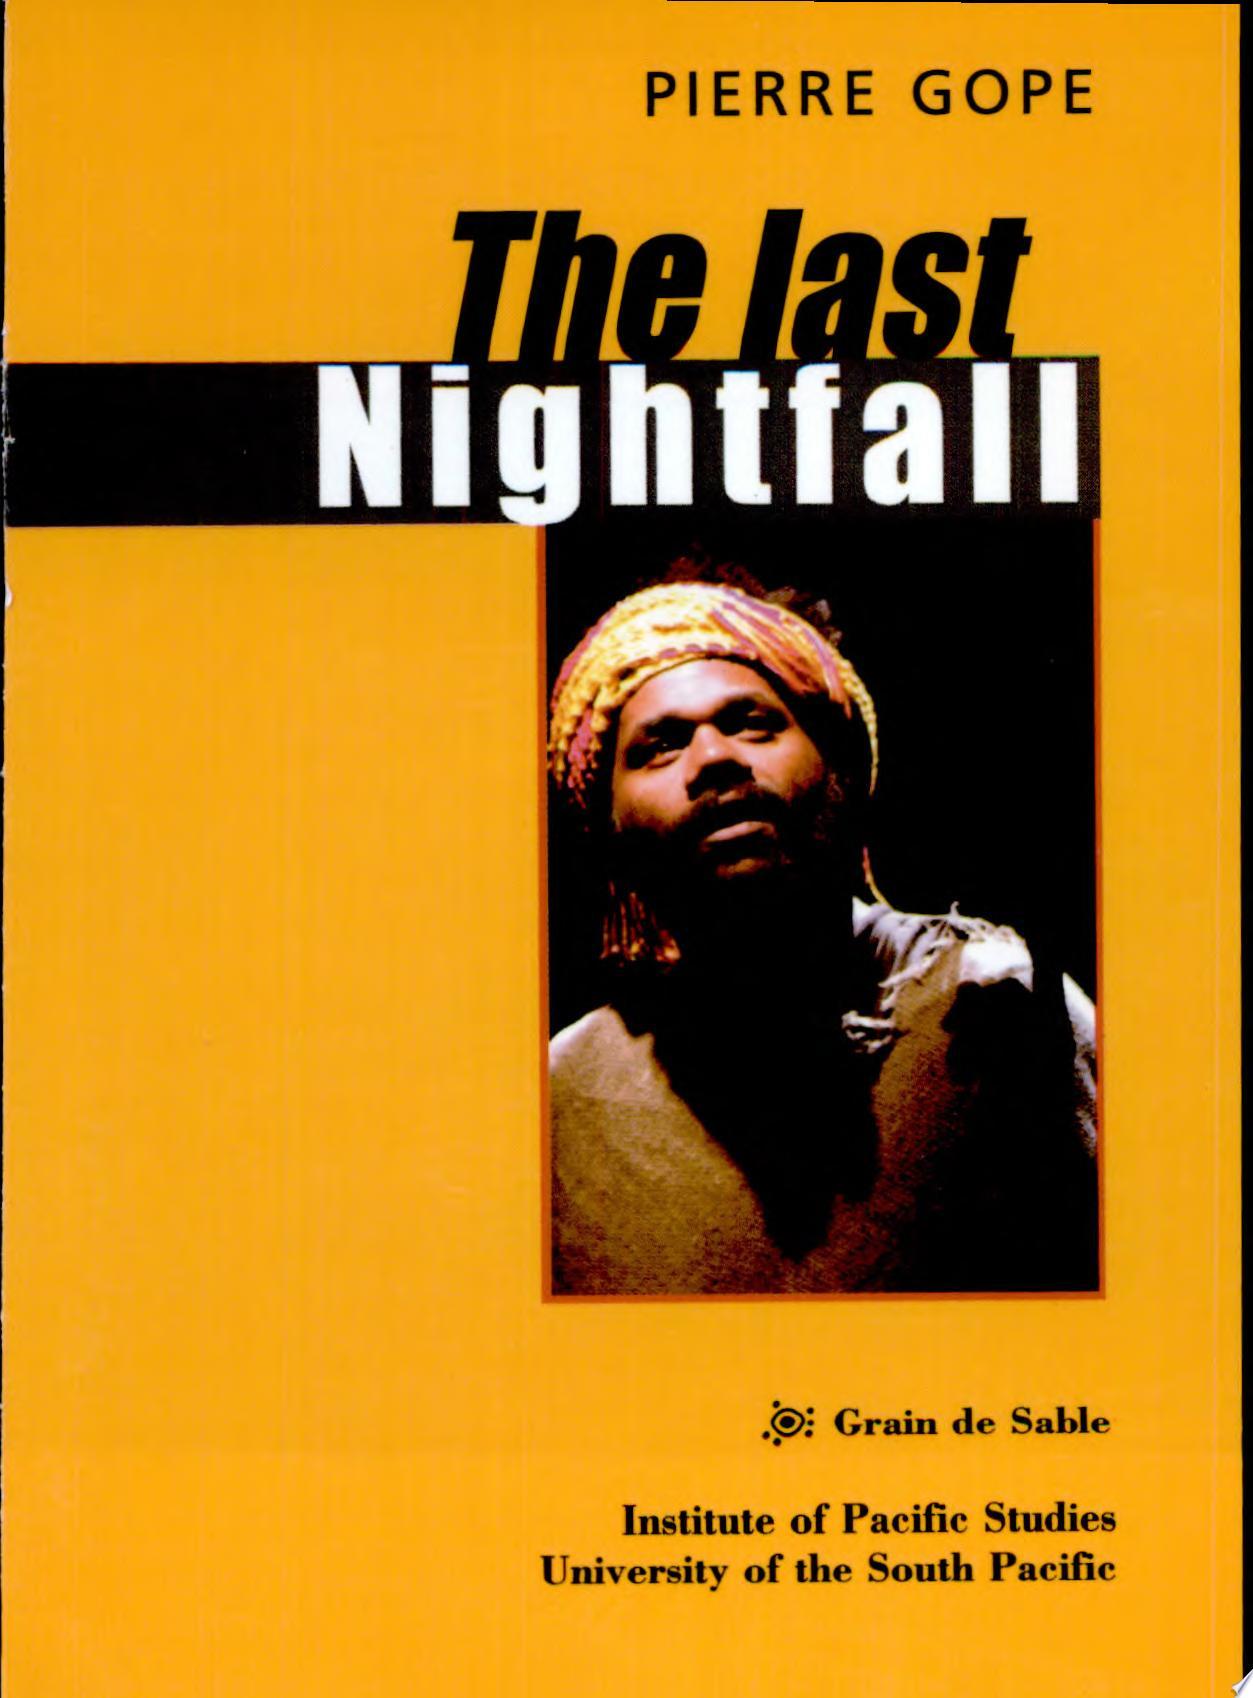 The Last Nightfall